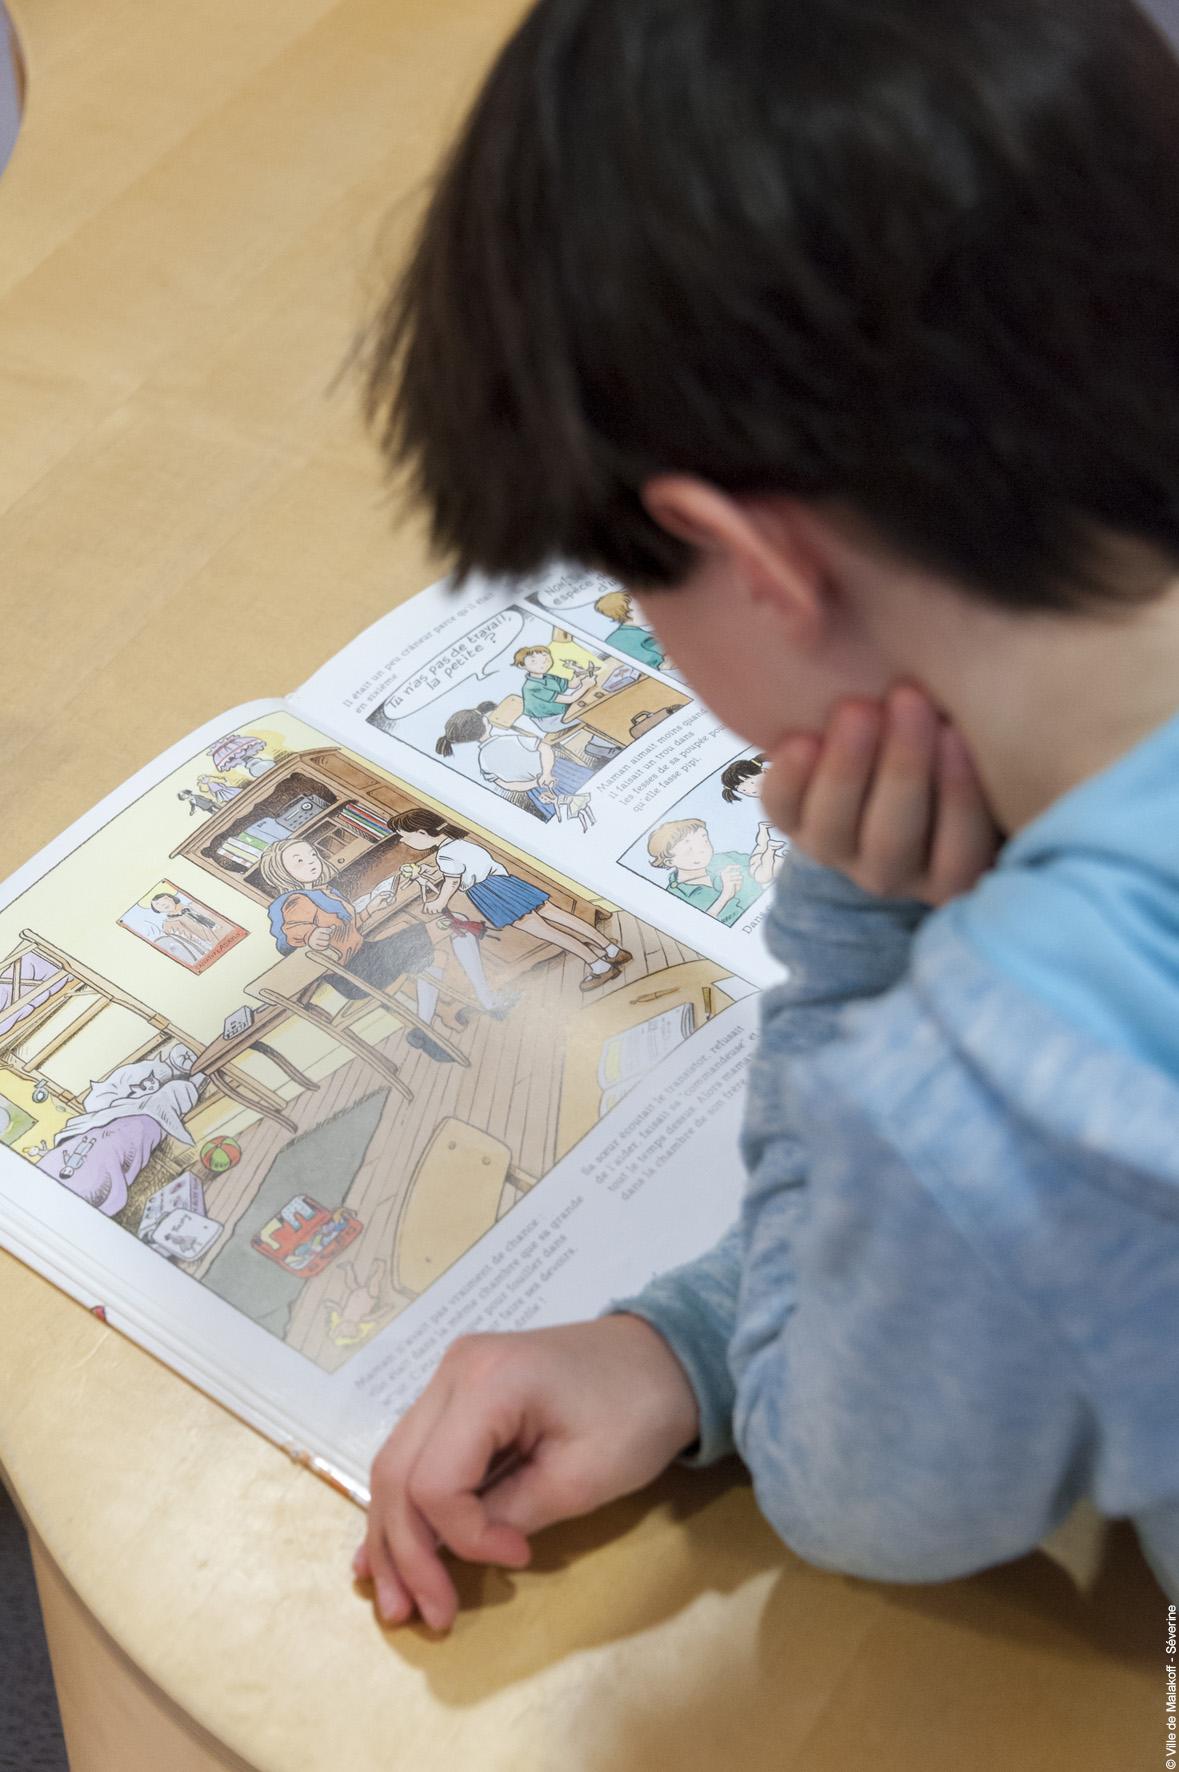 Un lecteur lors de l'exposition à Malakoff